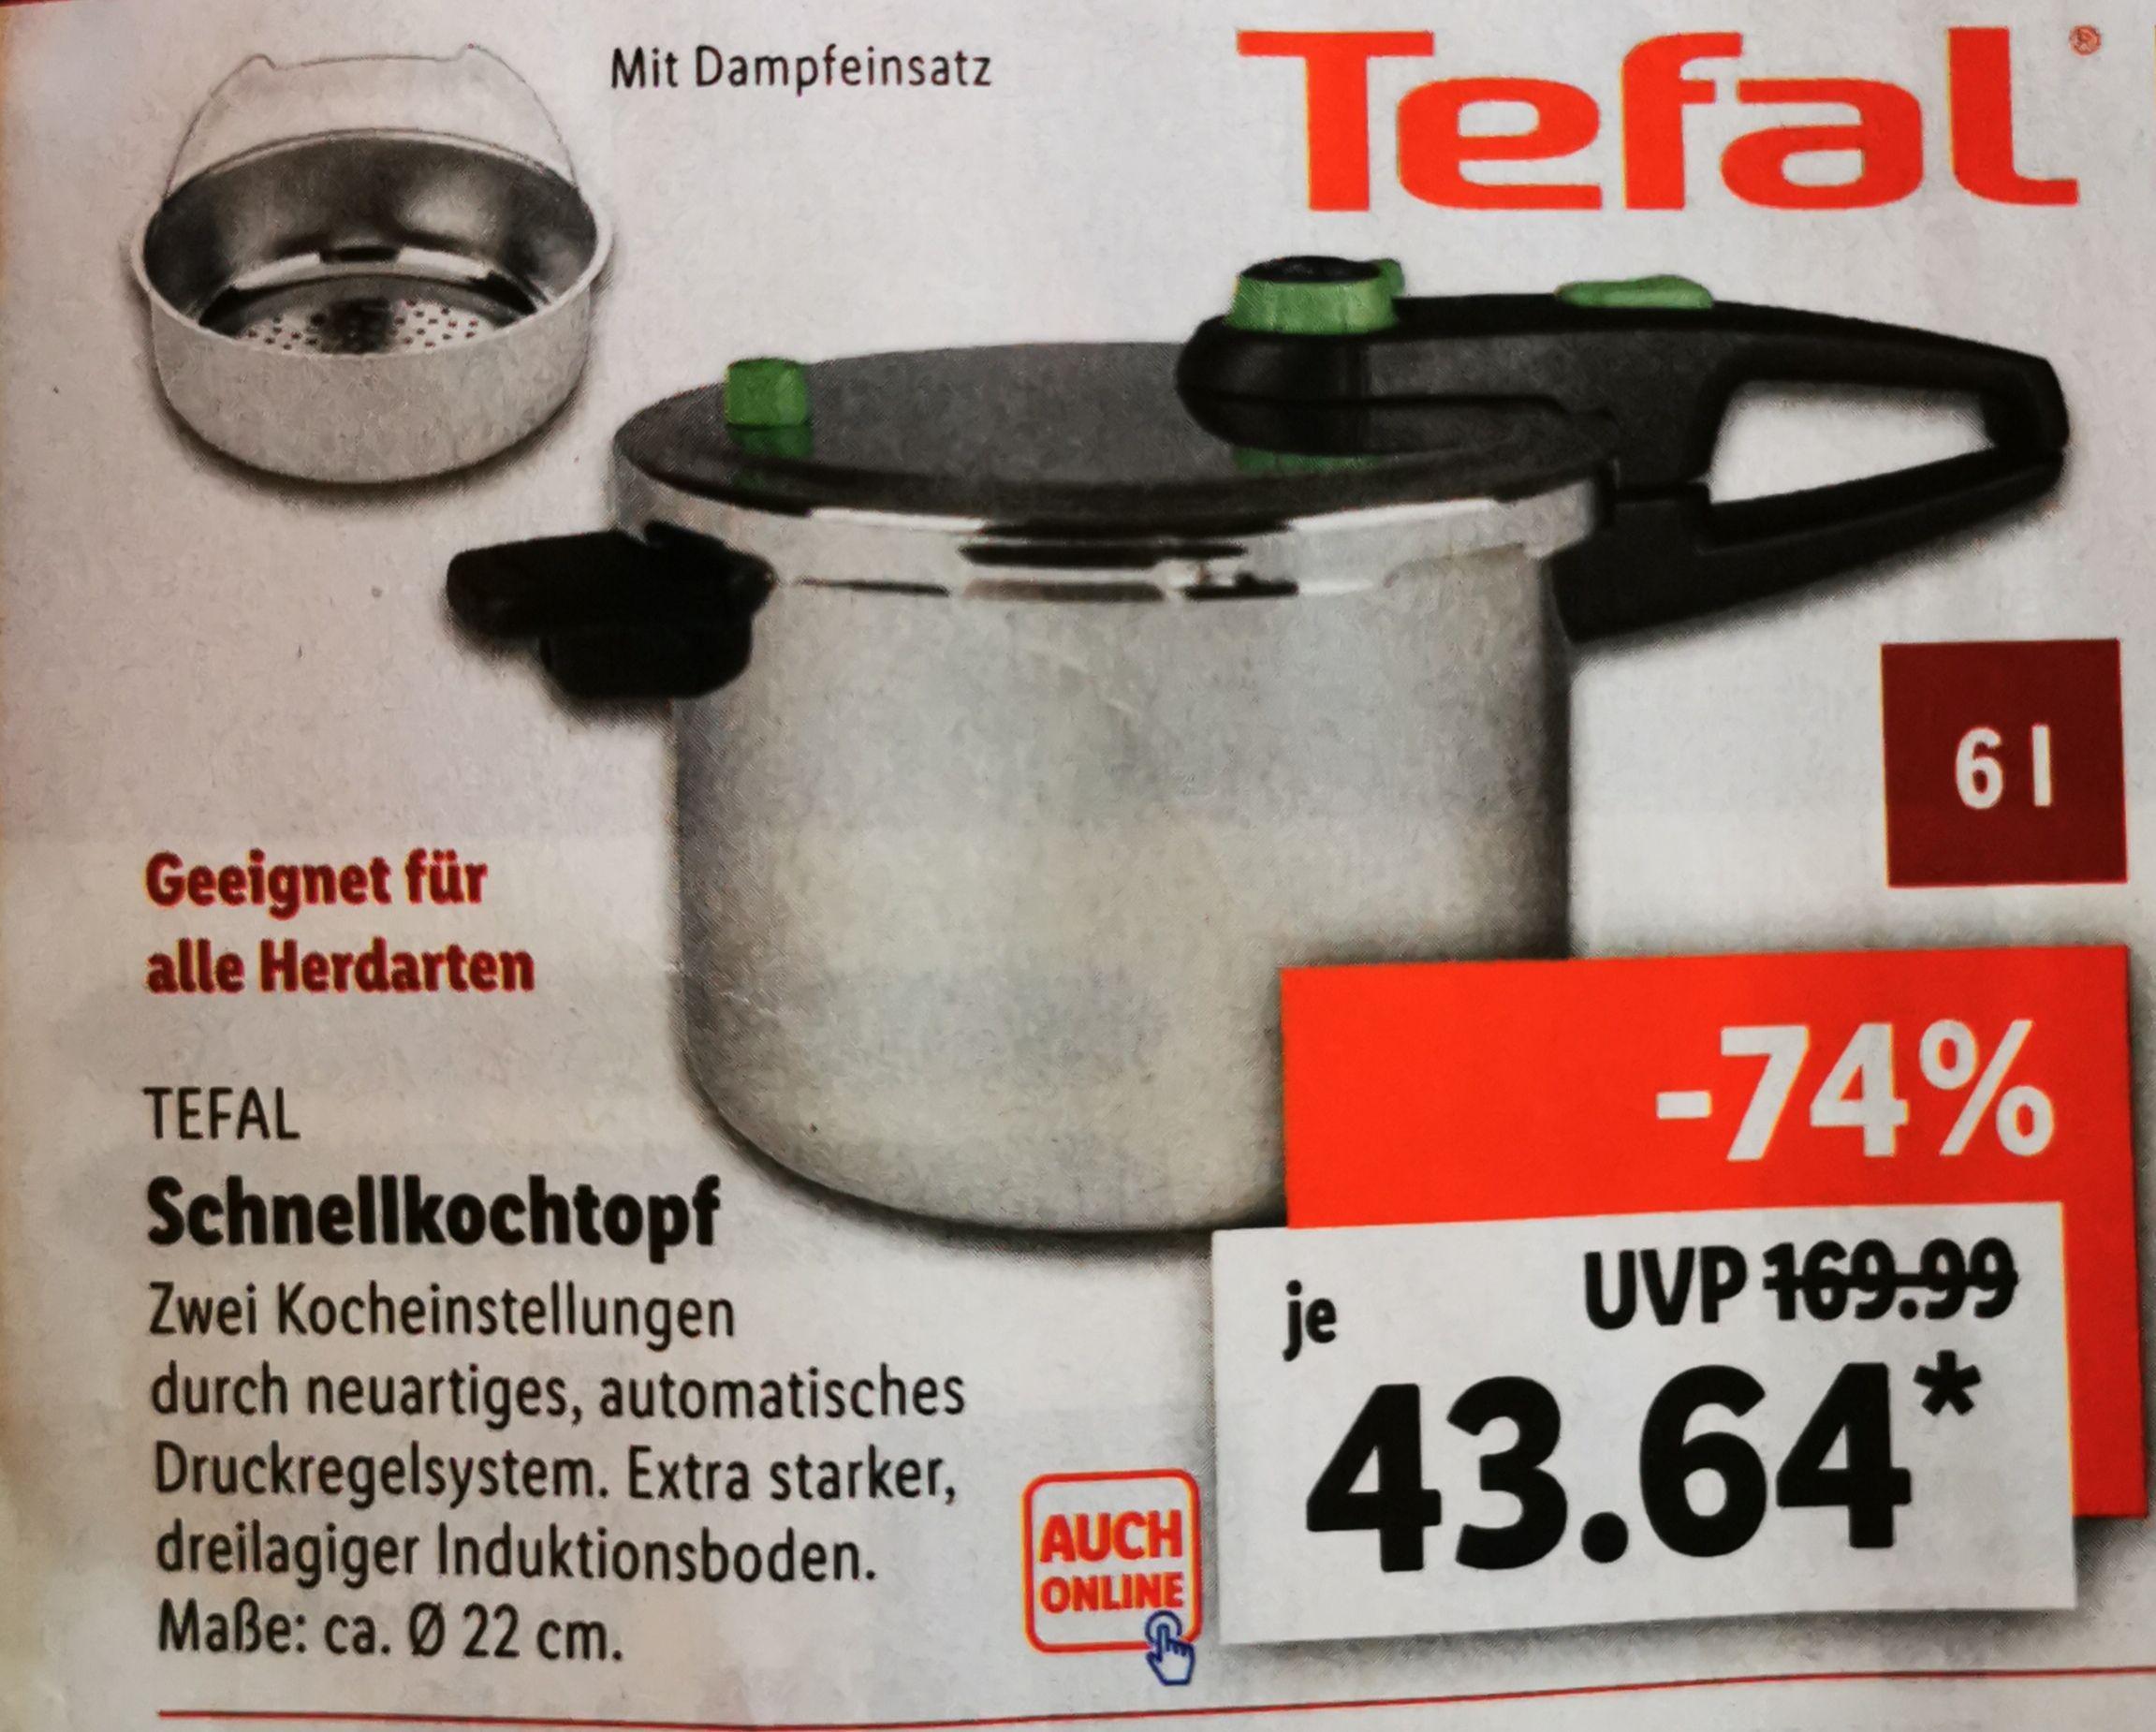 Tefal Schnellkochtopf 6l